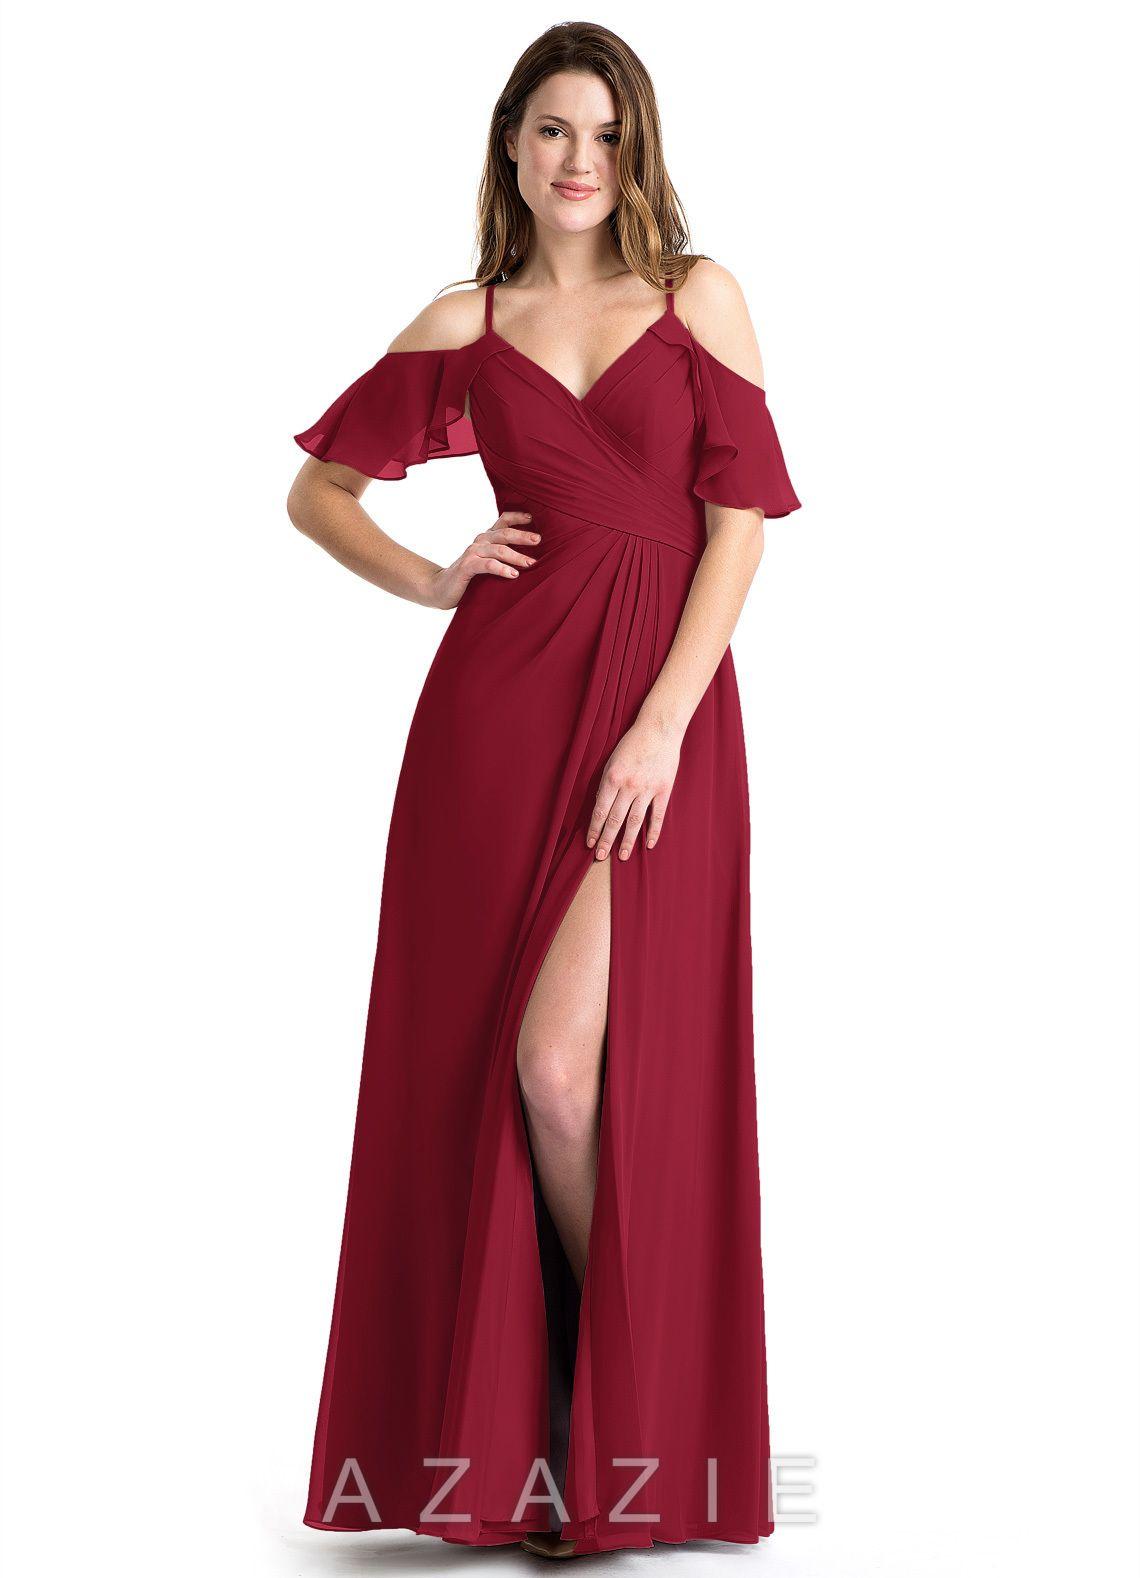 3984560b57f Azazie Dakota Bridesmaid Dress - Flamingo